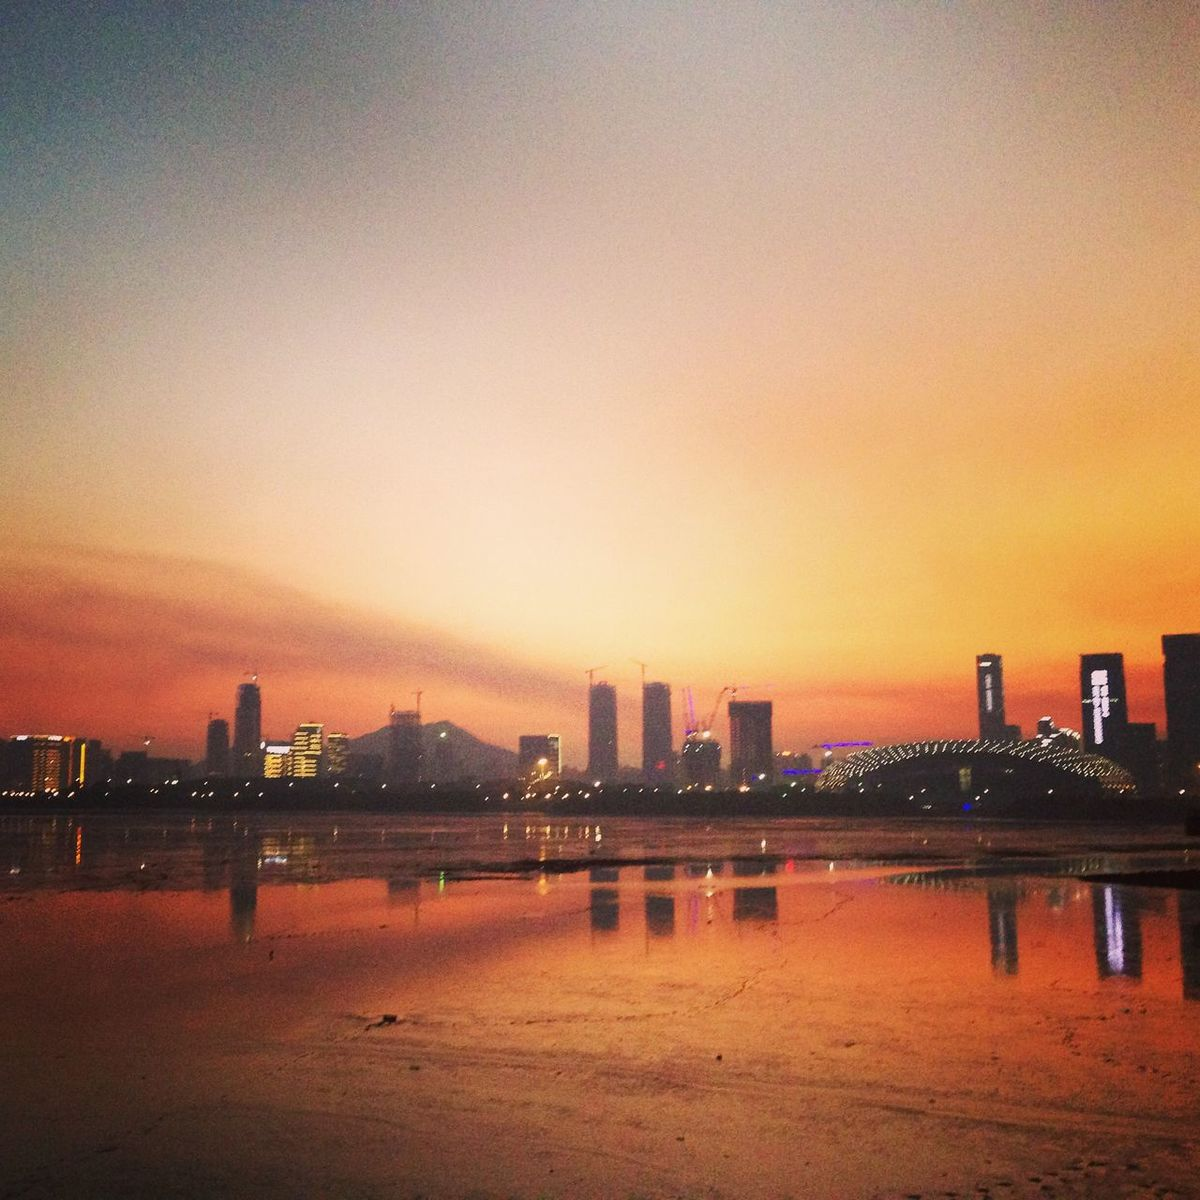 Take a walk ! Taking Photos Enjoying Life IPhoneography Walking Around Sunset Beautiful Sunset Hello World